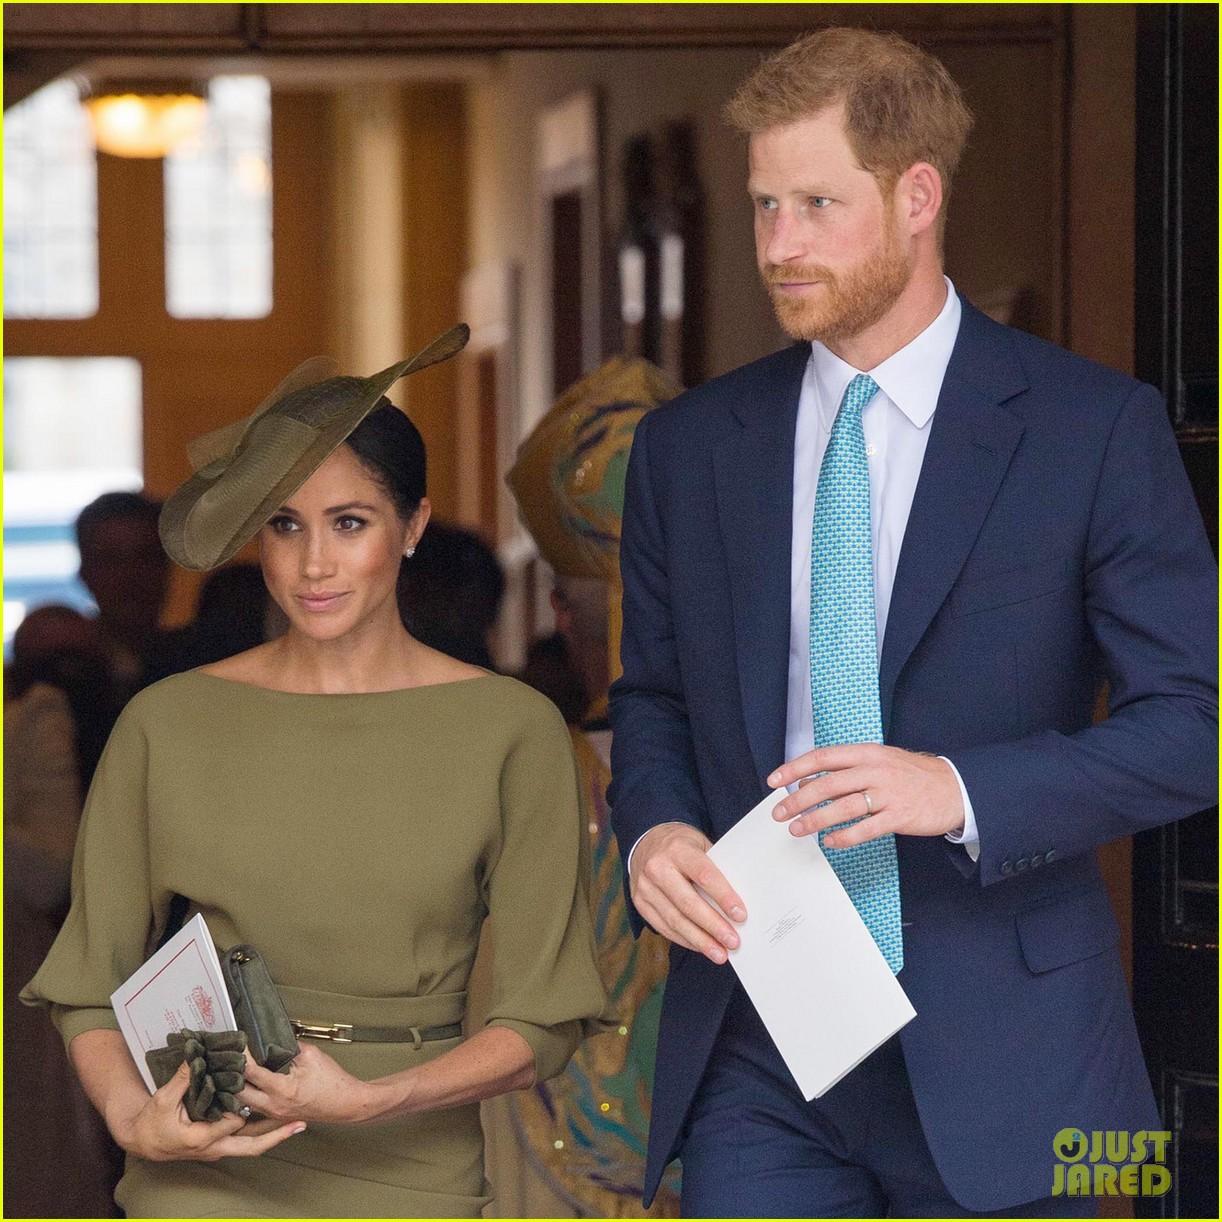 Full Sized Photo Of Meghan Markle Prince Harry Prince